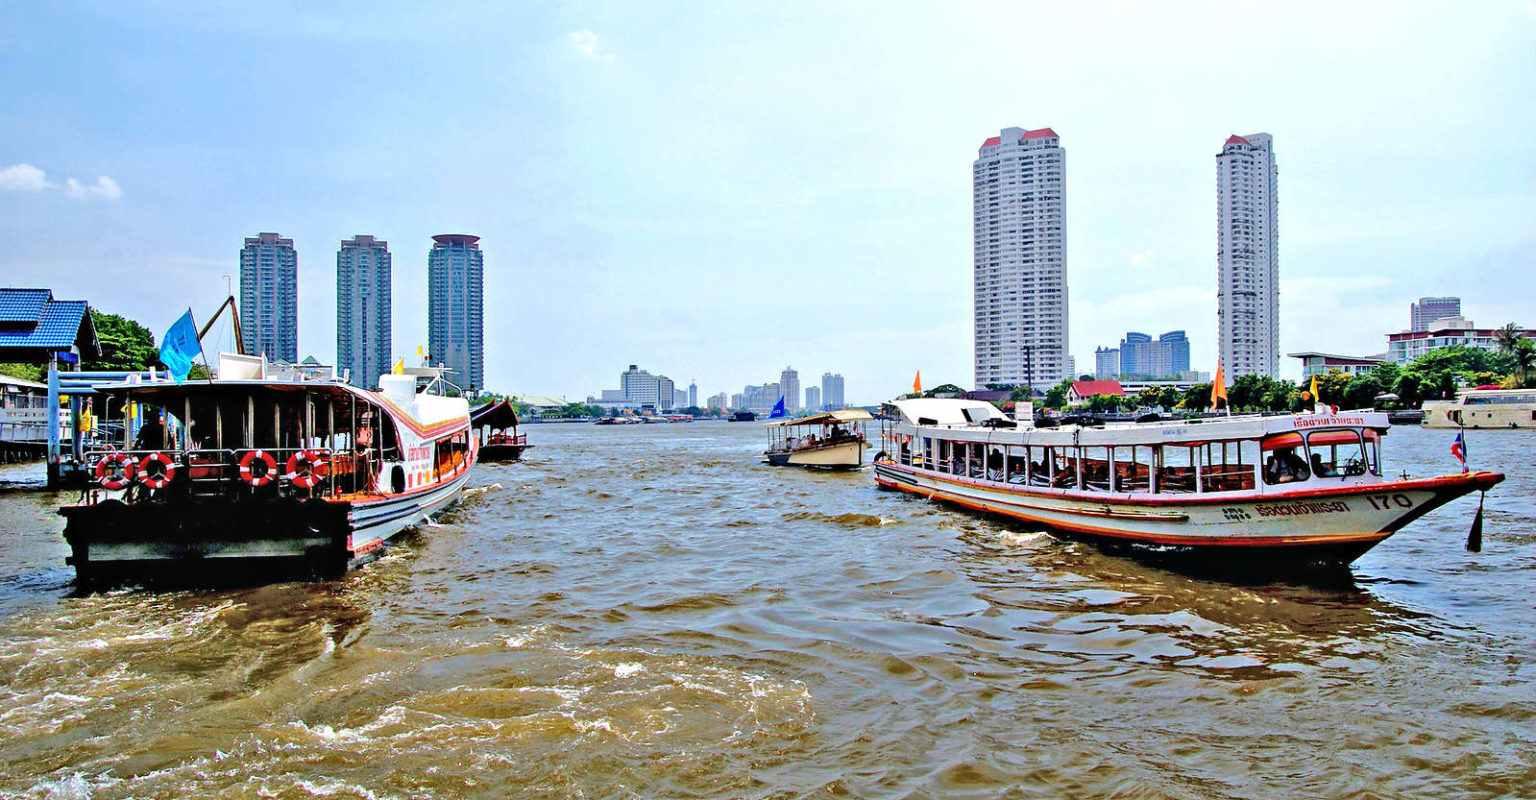 Boats on the Chao Phraya River of Bangkok